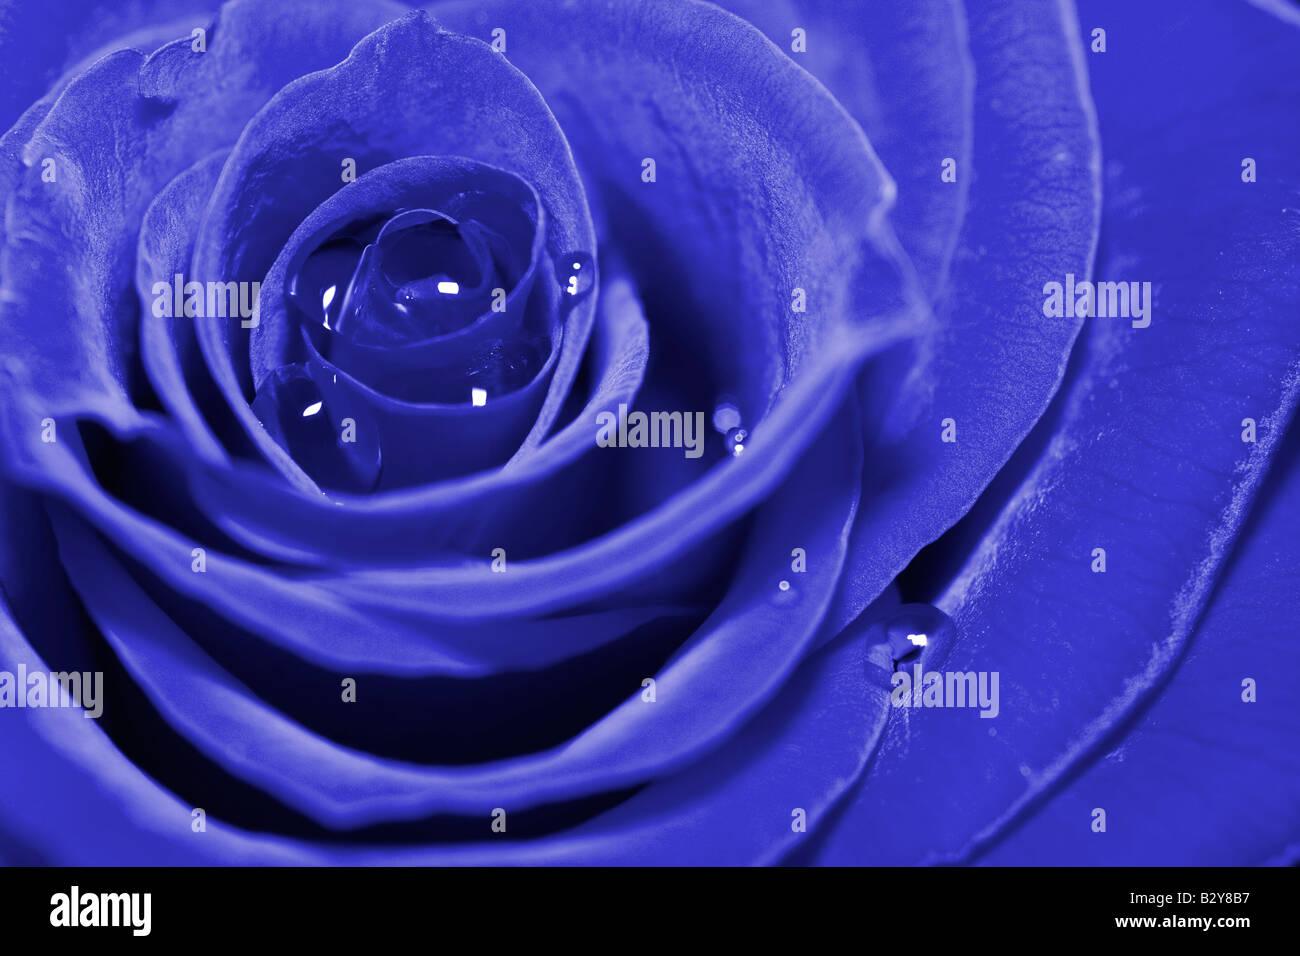 rosa azul Imagen De Stock